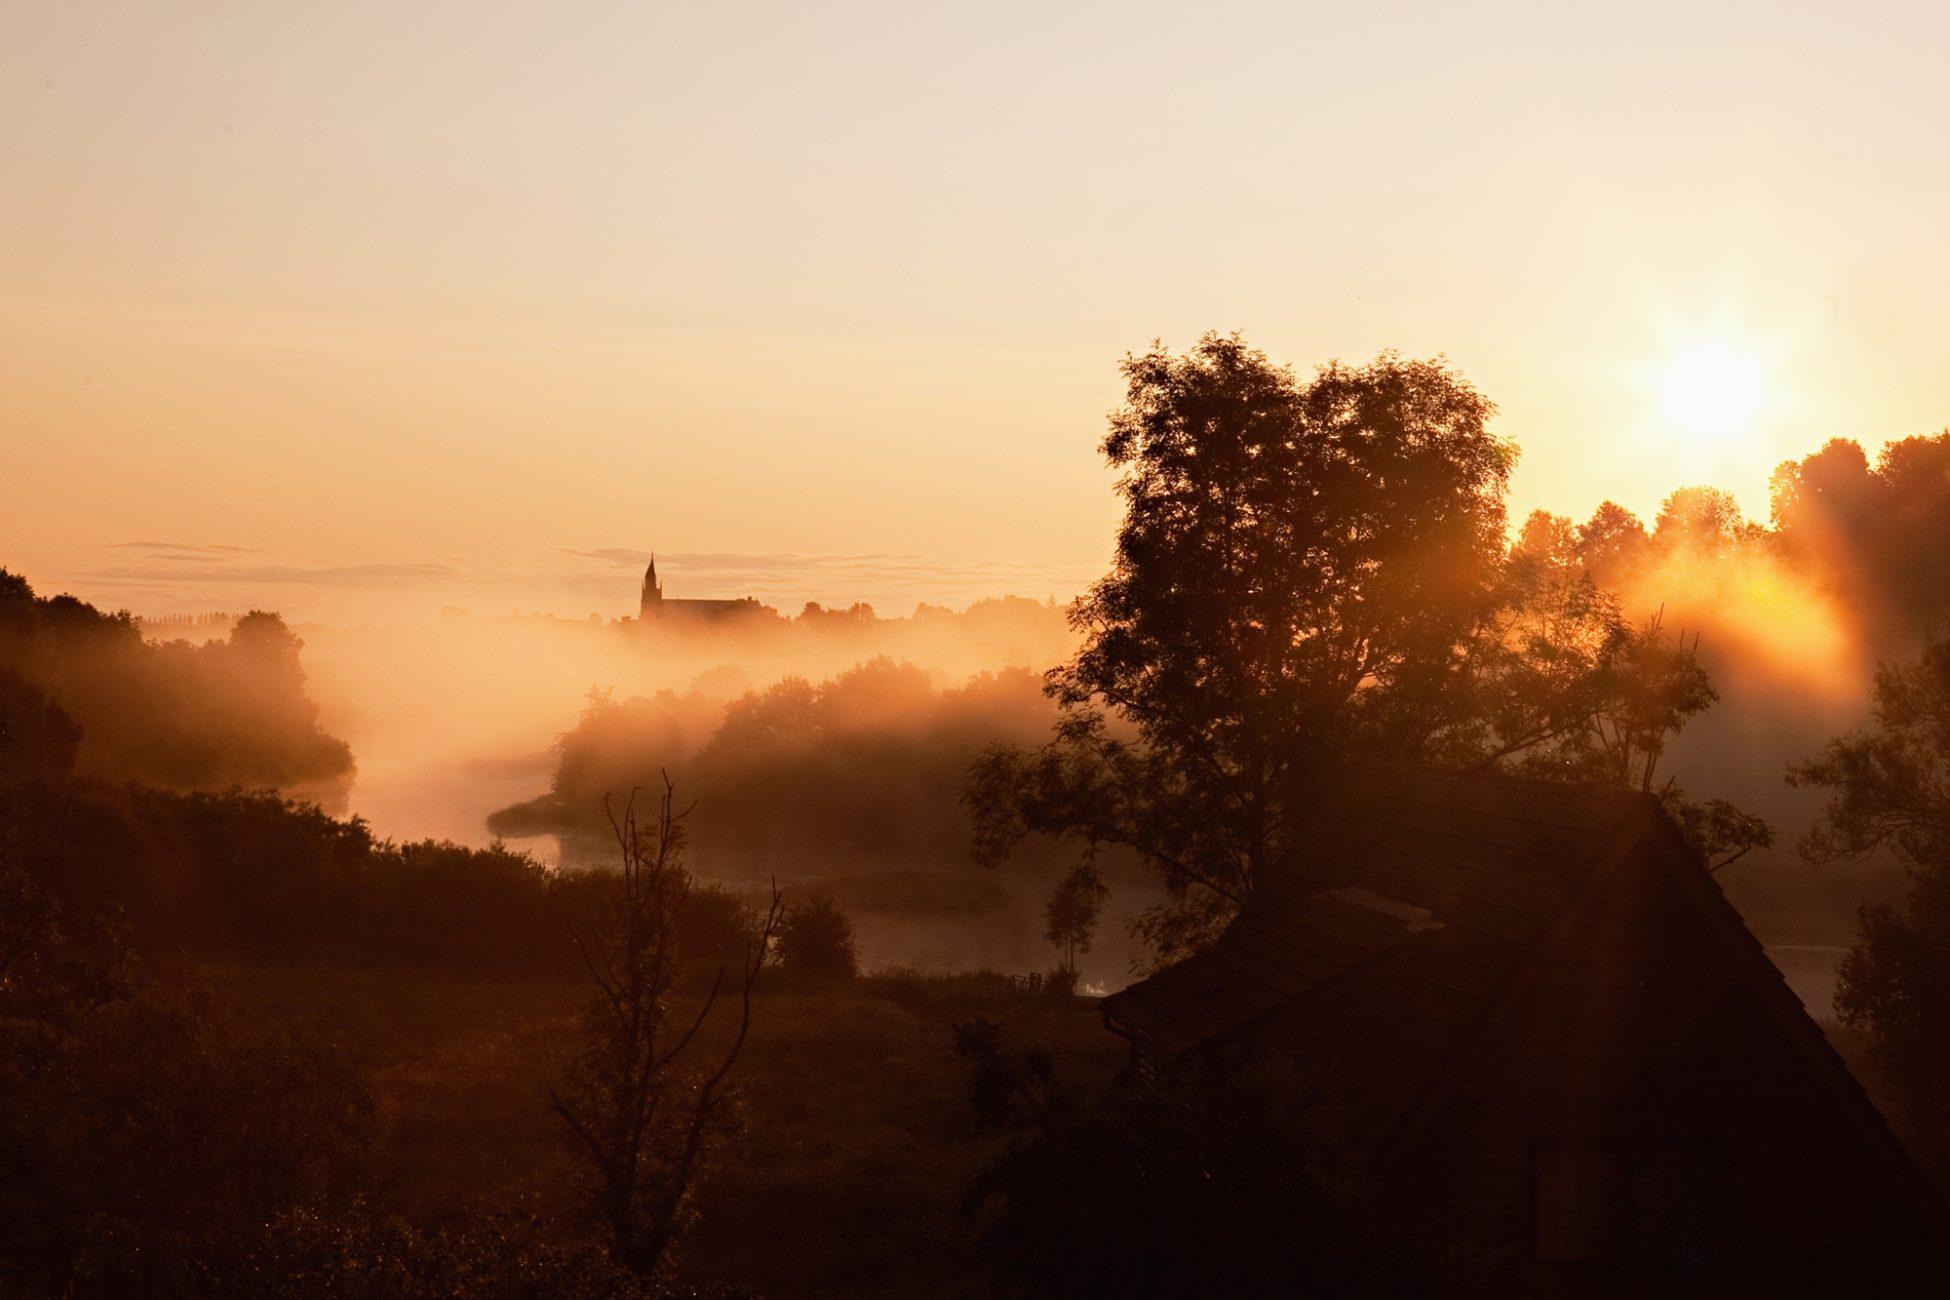 foggy ireland morning